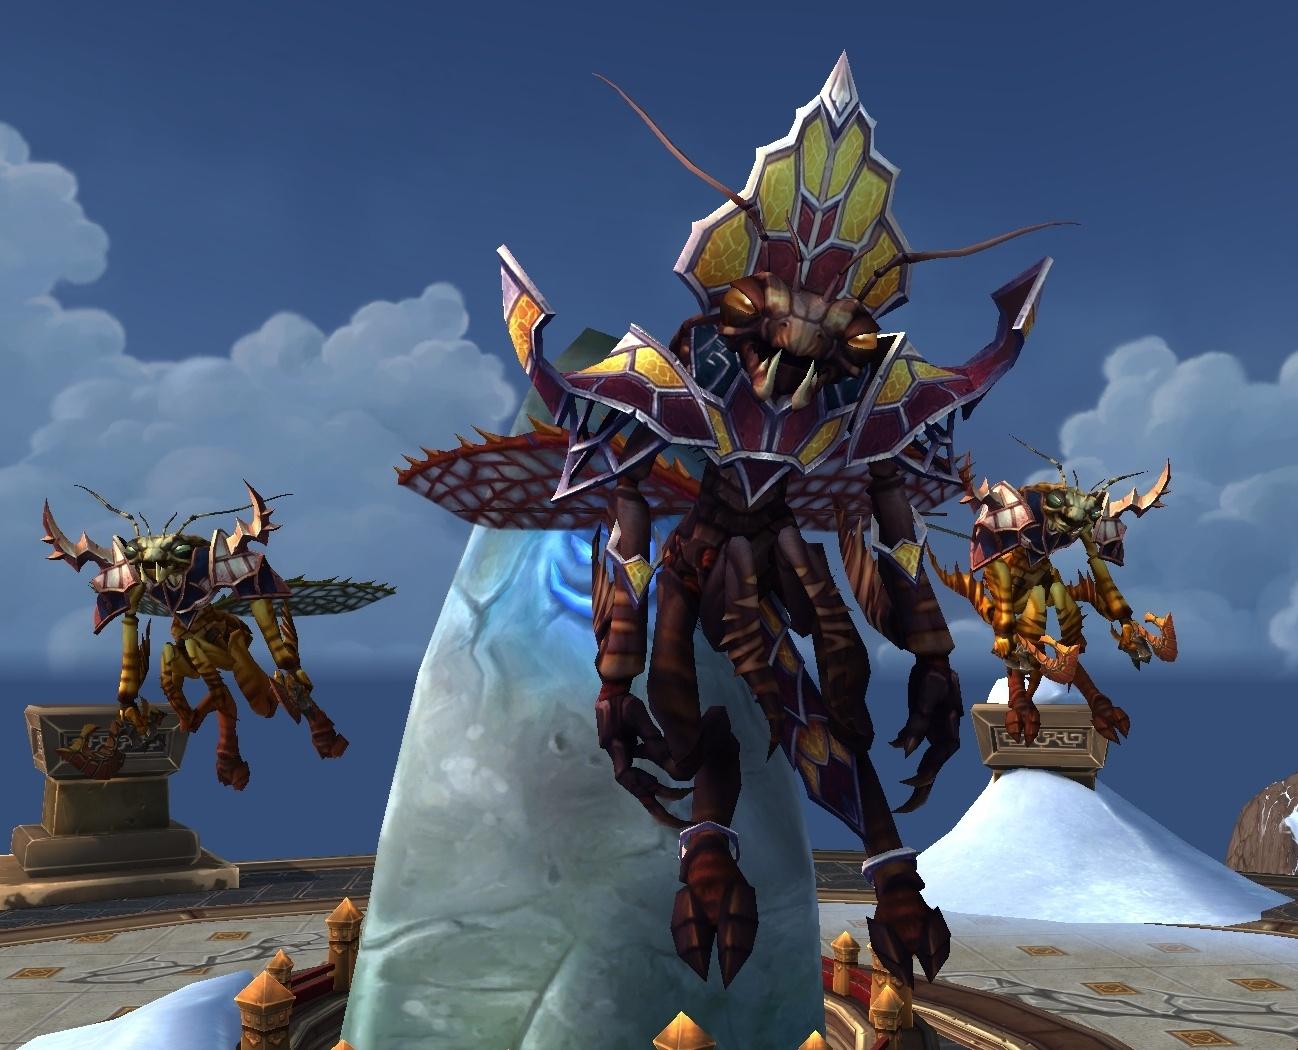 DNT] Credit - Mantid Ambush Defeated - NPC - World of Warcraft